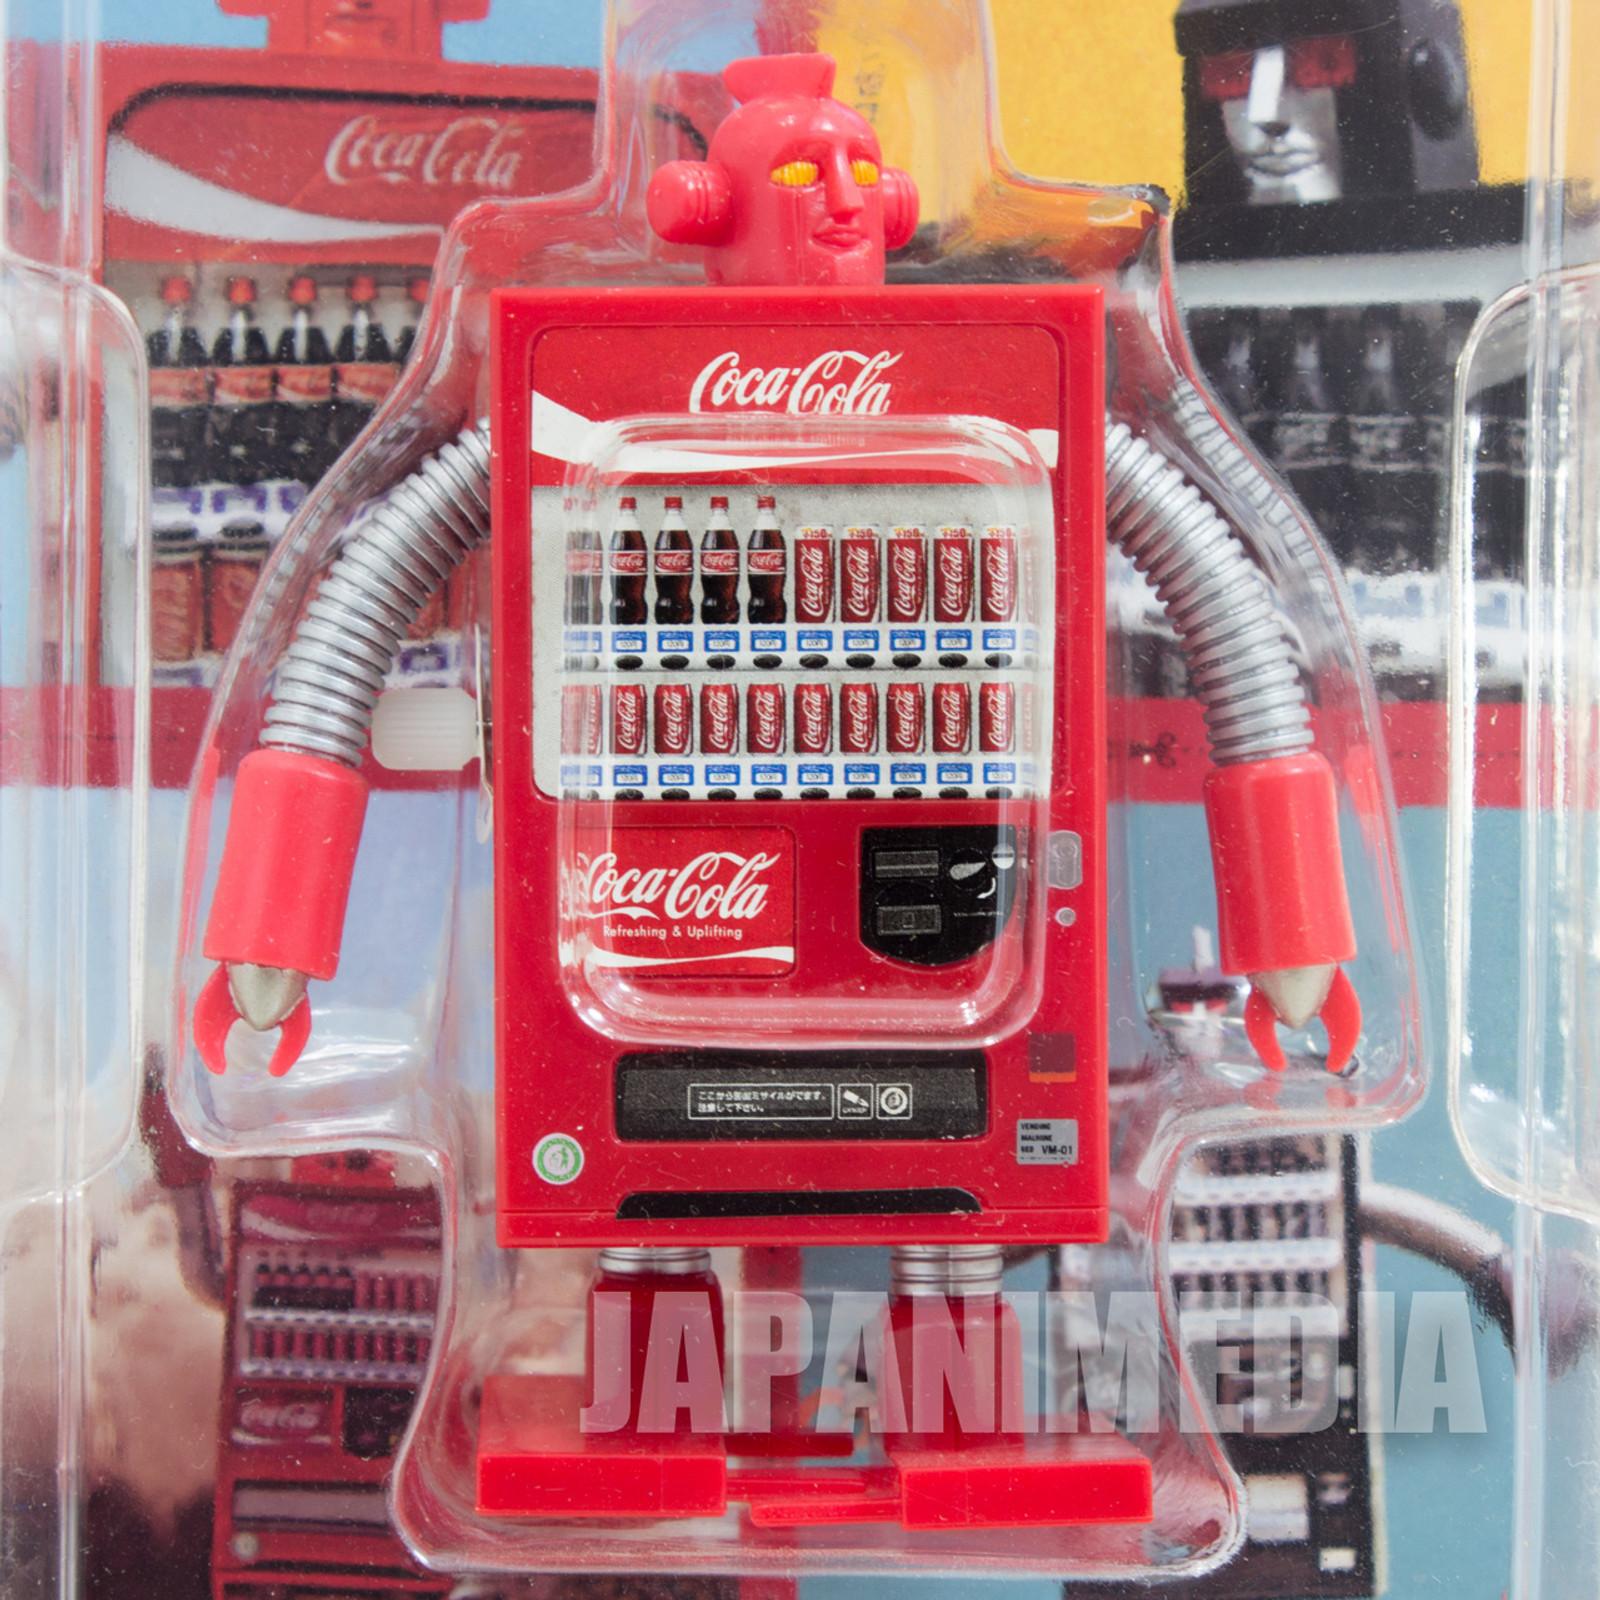 Coca-Cola Bending Machine Robot Wind-up Walking Figure Red ver. SEGA JAPAN